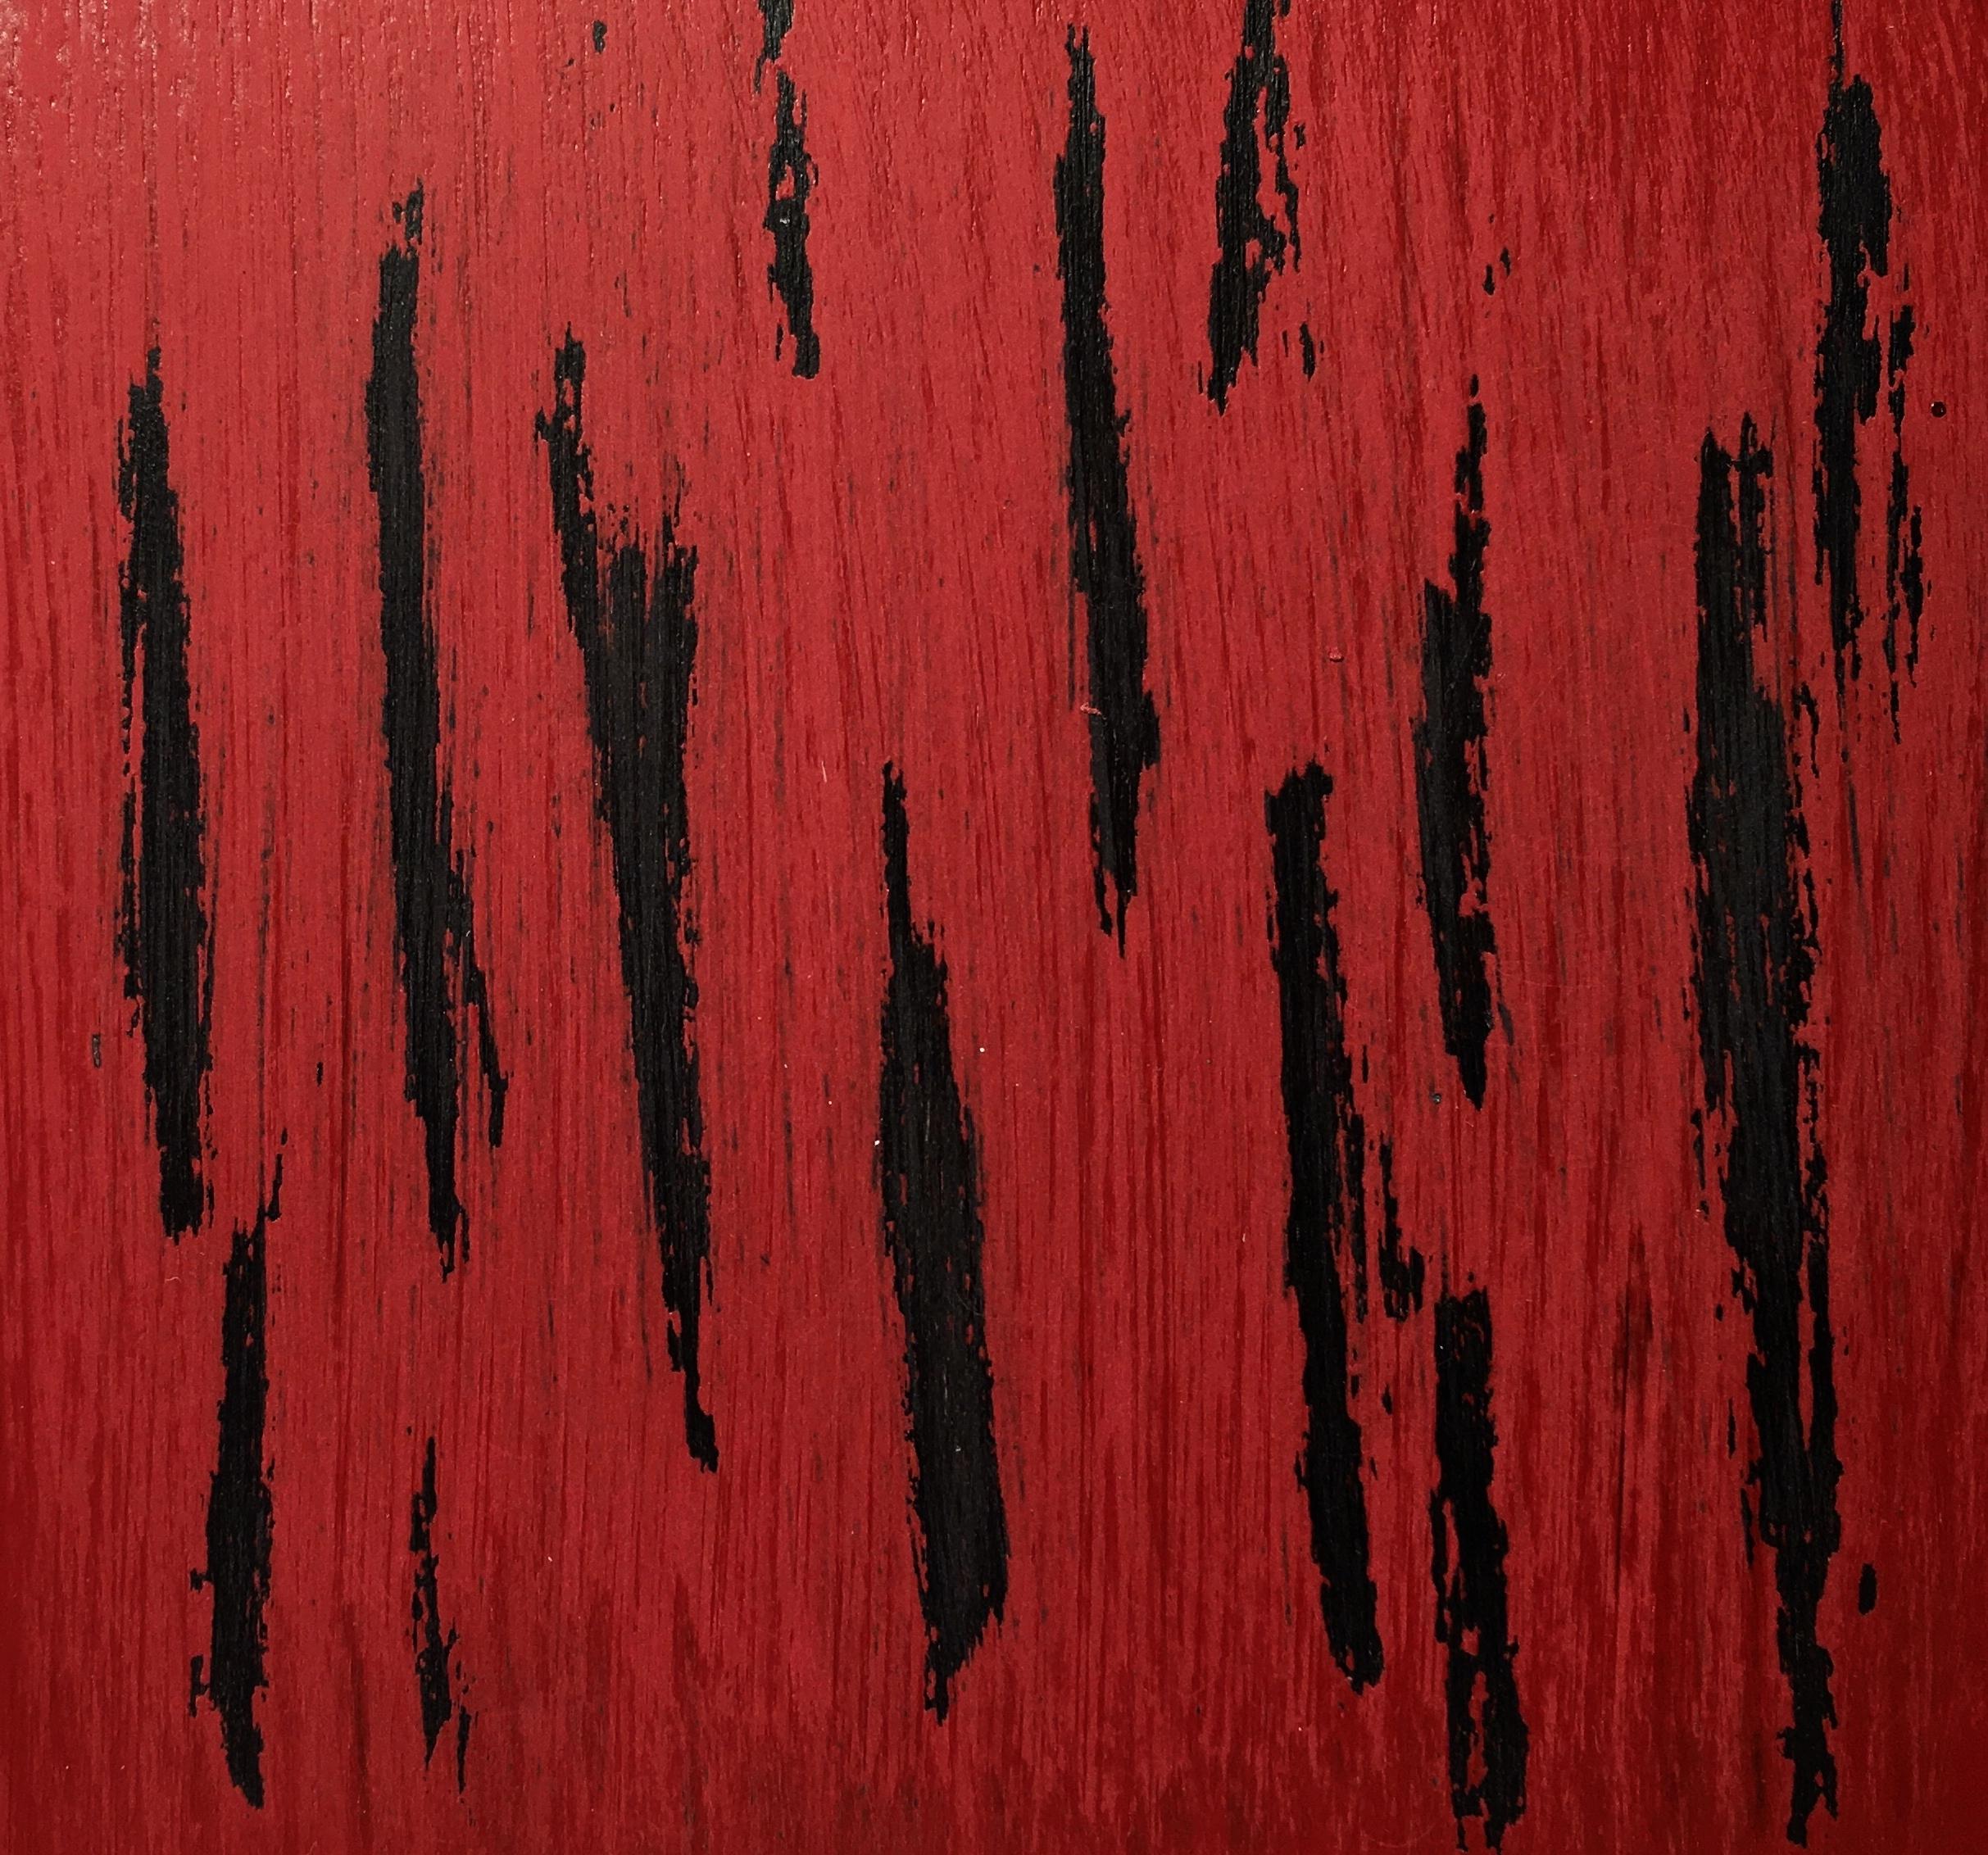 Crimson red over Onyx black